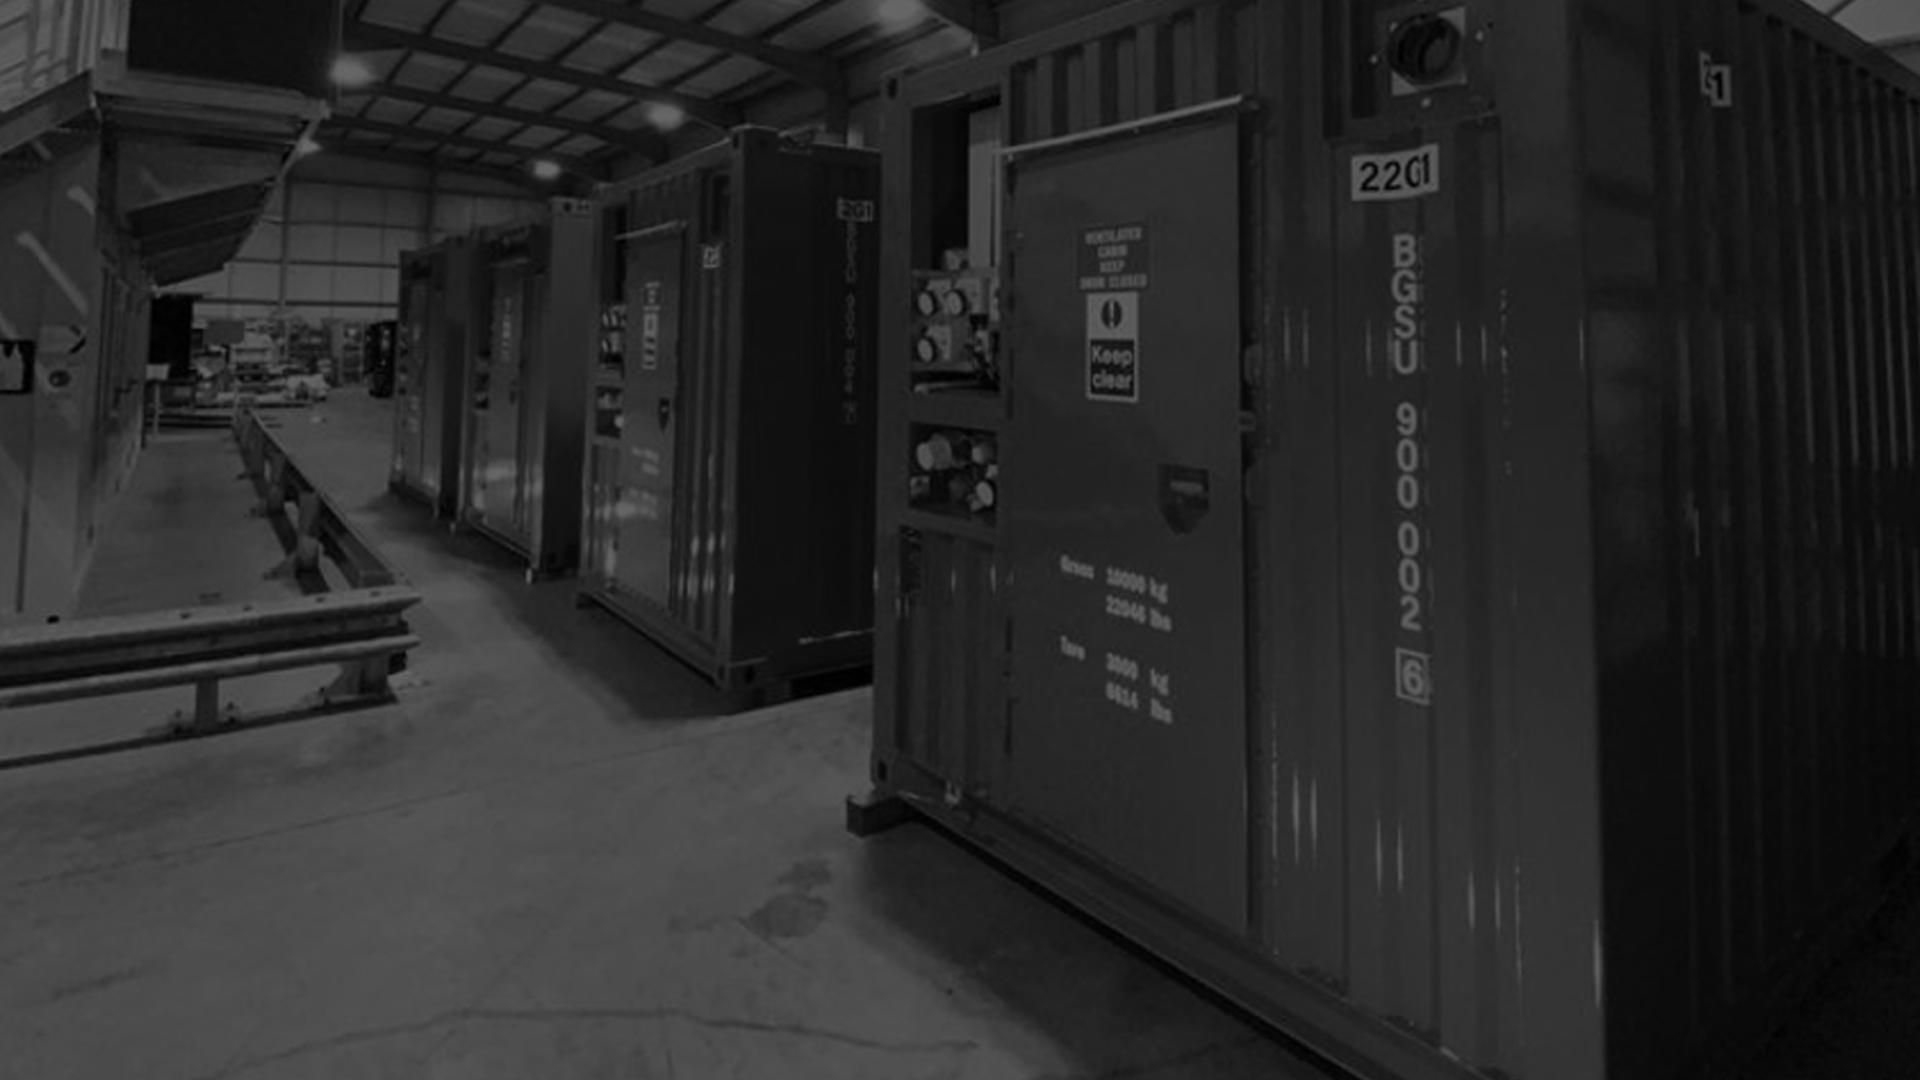 DNV 2.7-2 Safe Area Modules